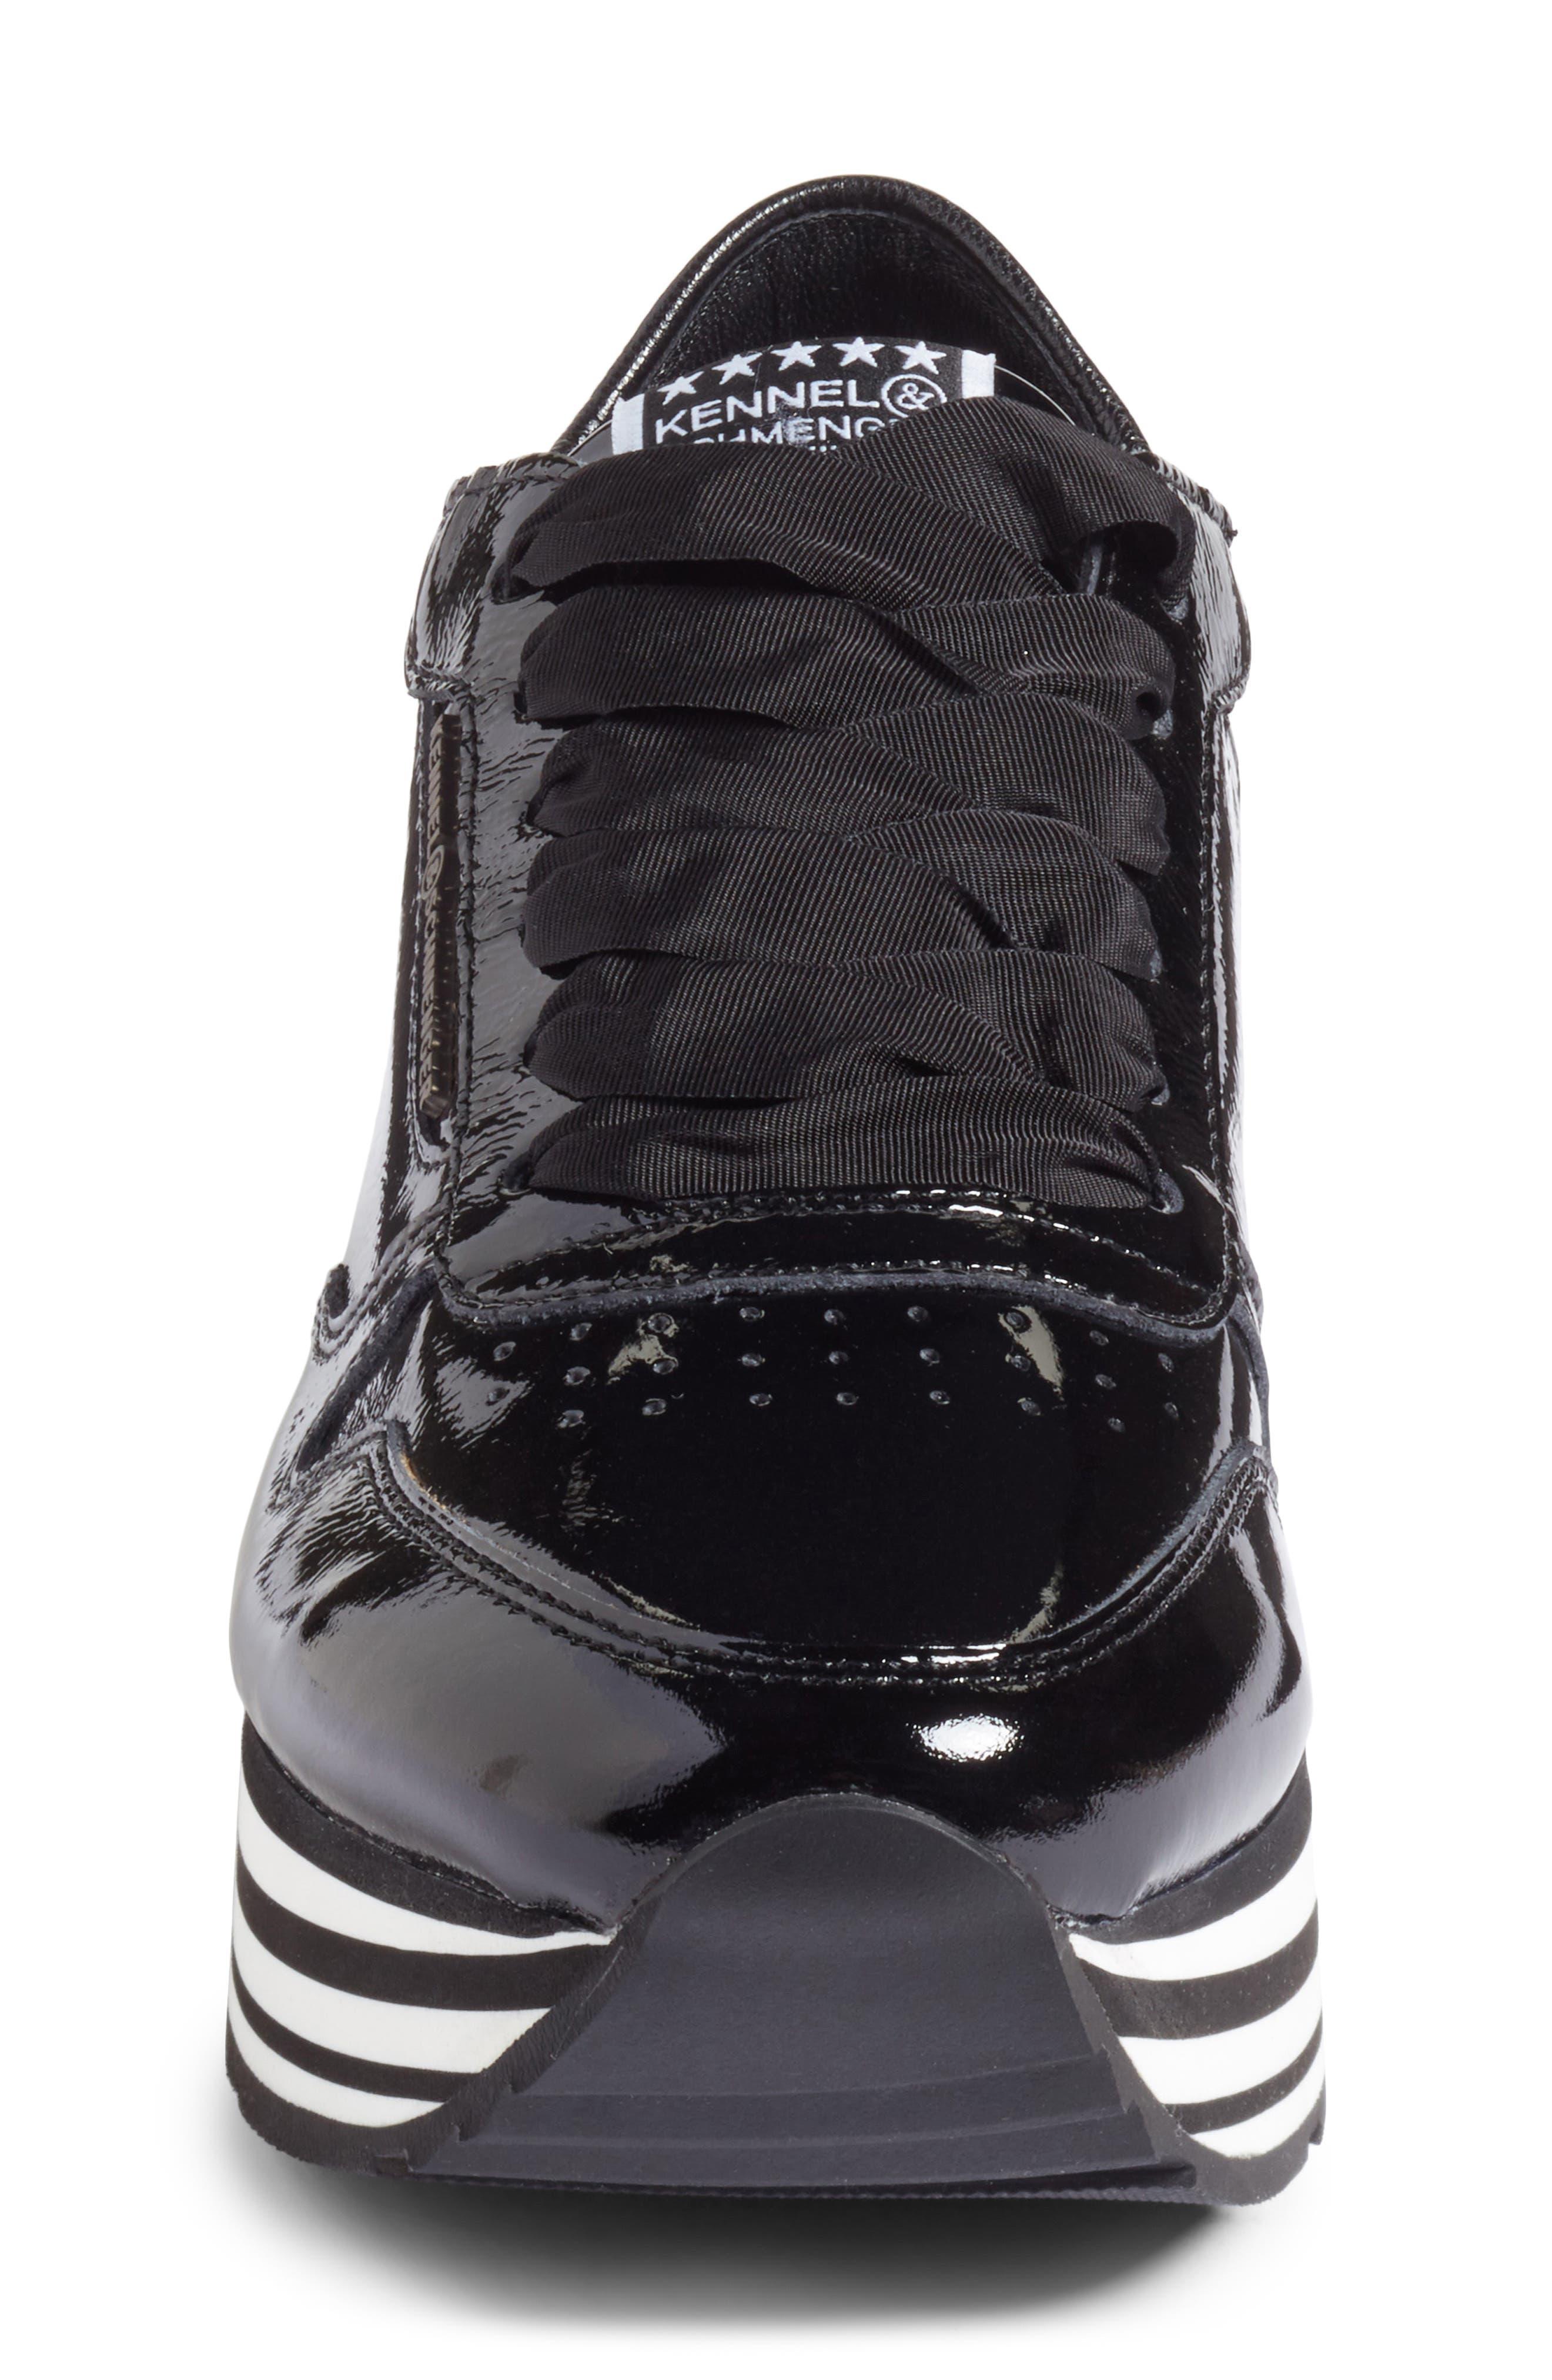 Kennel & Schmenger Nova Patent Leather Sneaker,                             Alternate thumbnail 4, color,                             Black